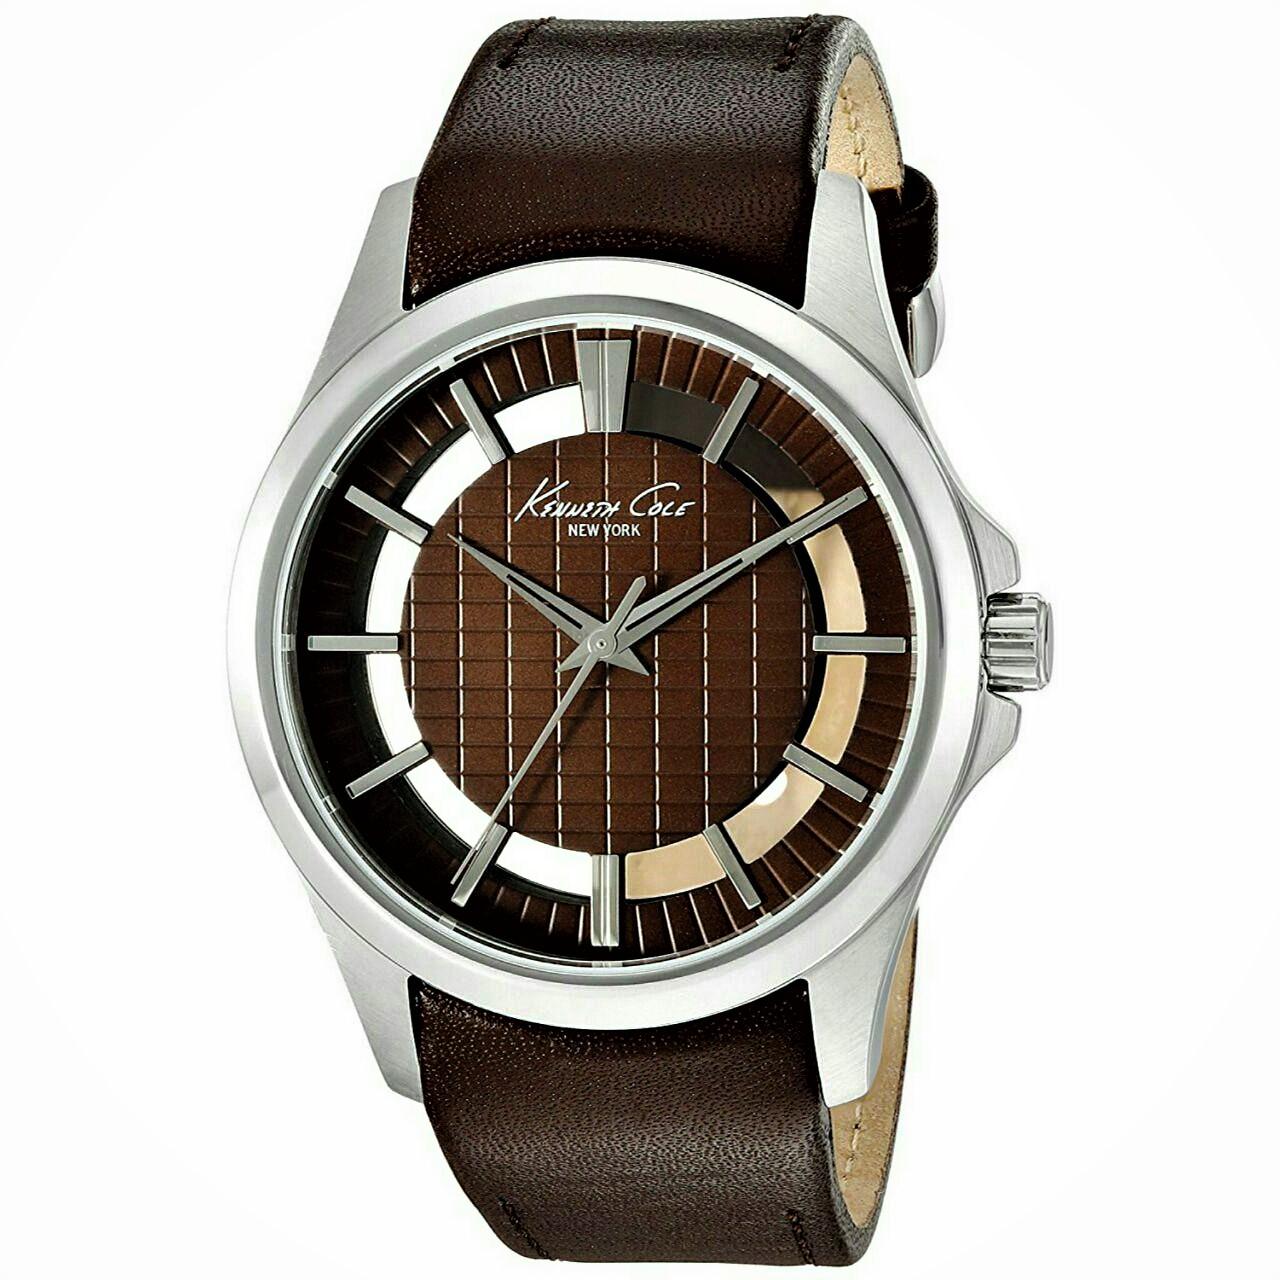 ساعت مچی عقربه ای مردانه کنت کول مدل KC10022289